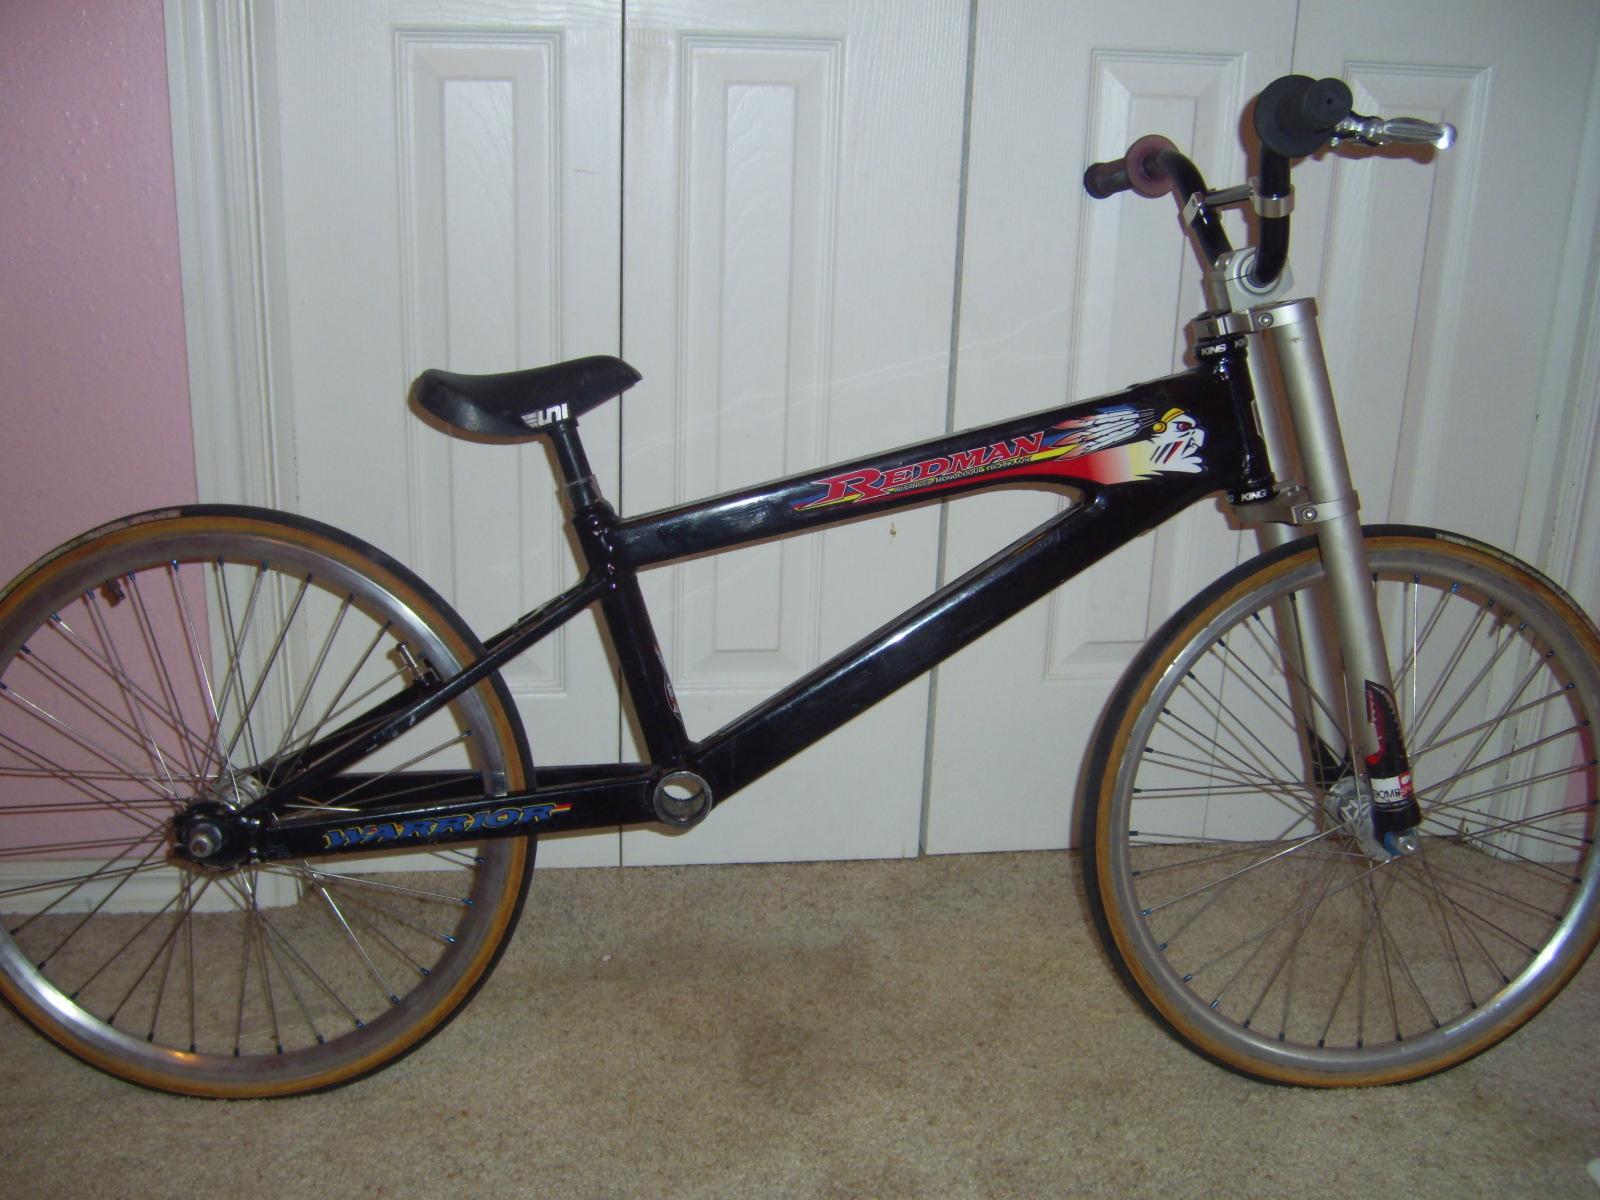 Redman - Visual Database - Frame Sets or Complete BMX Bicycles - BMX ...